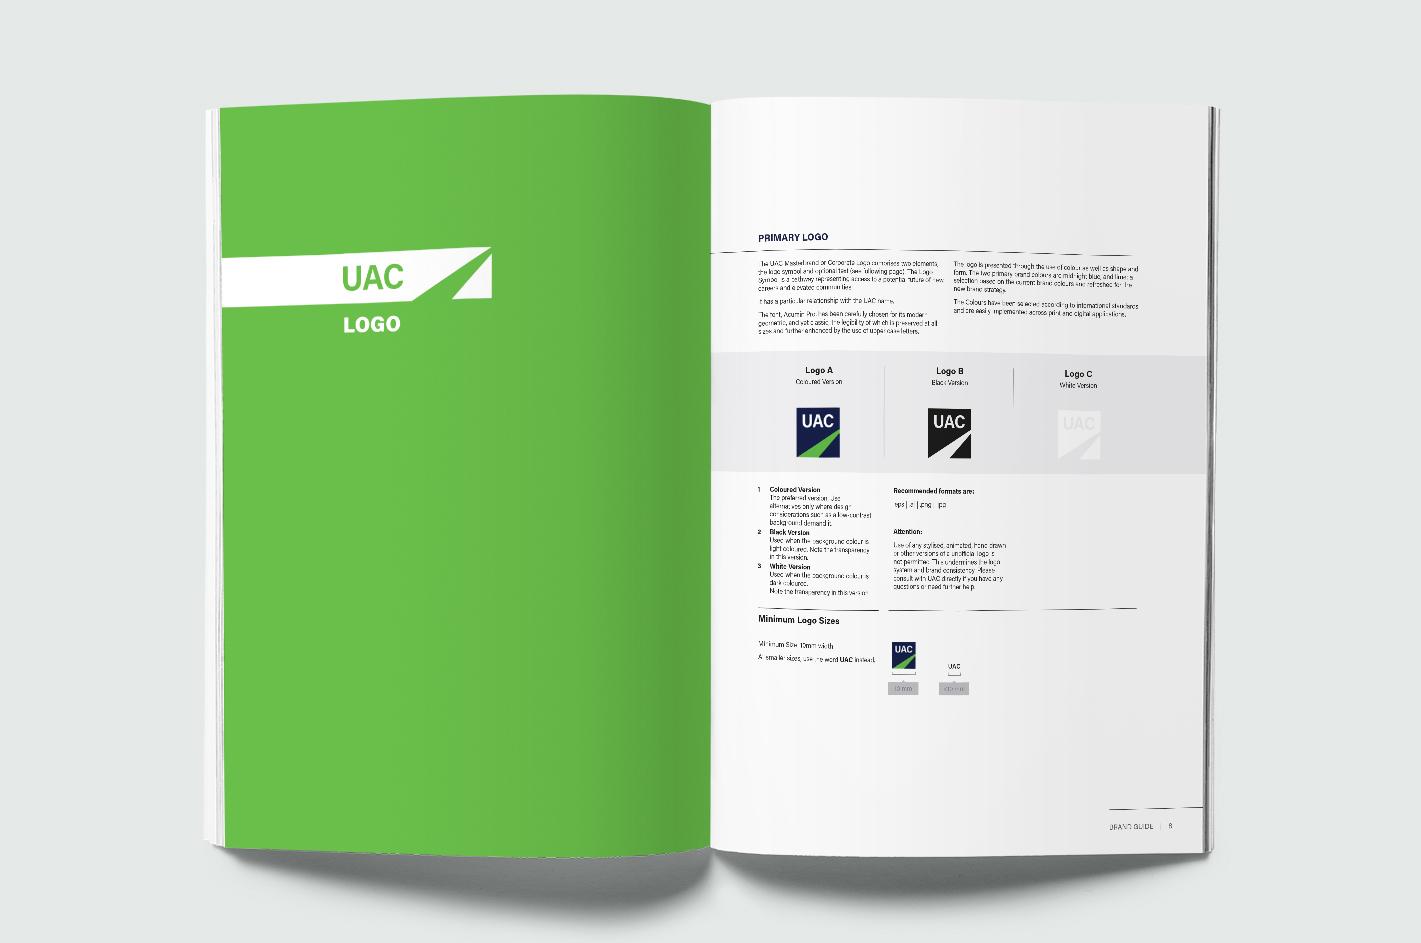 UAC_BrandGuide_Magazine_MockUp_spread1.jpg